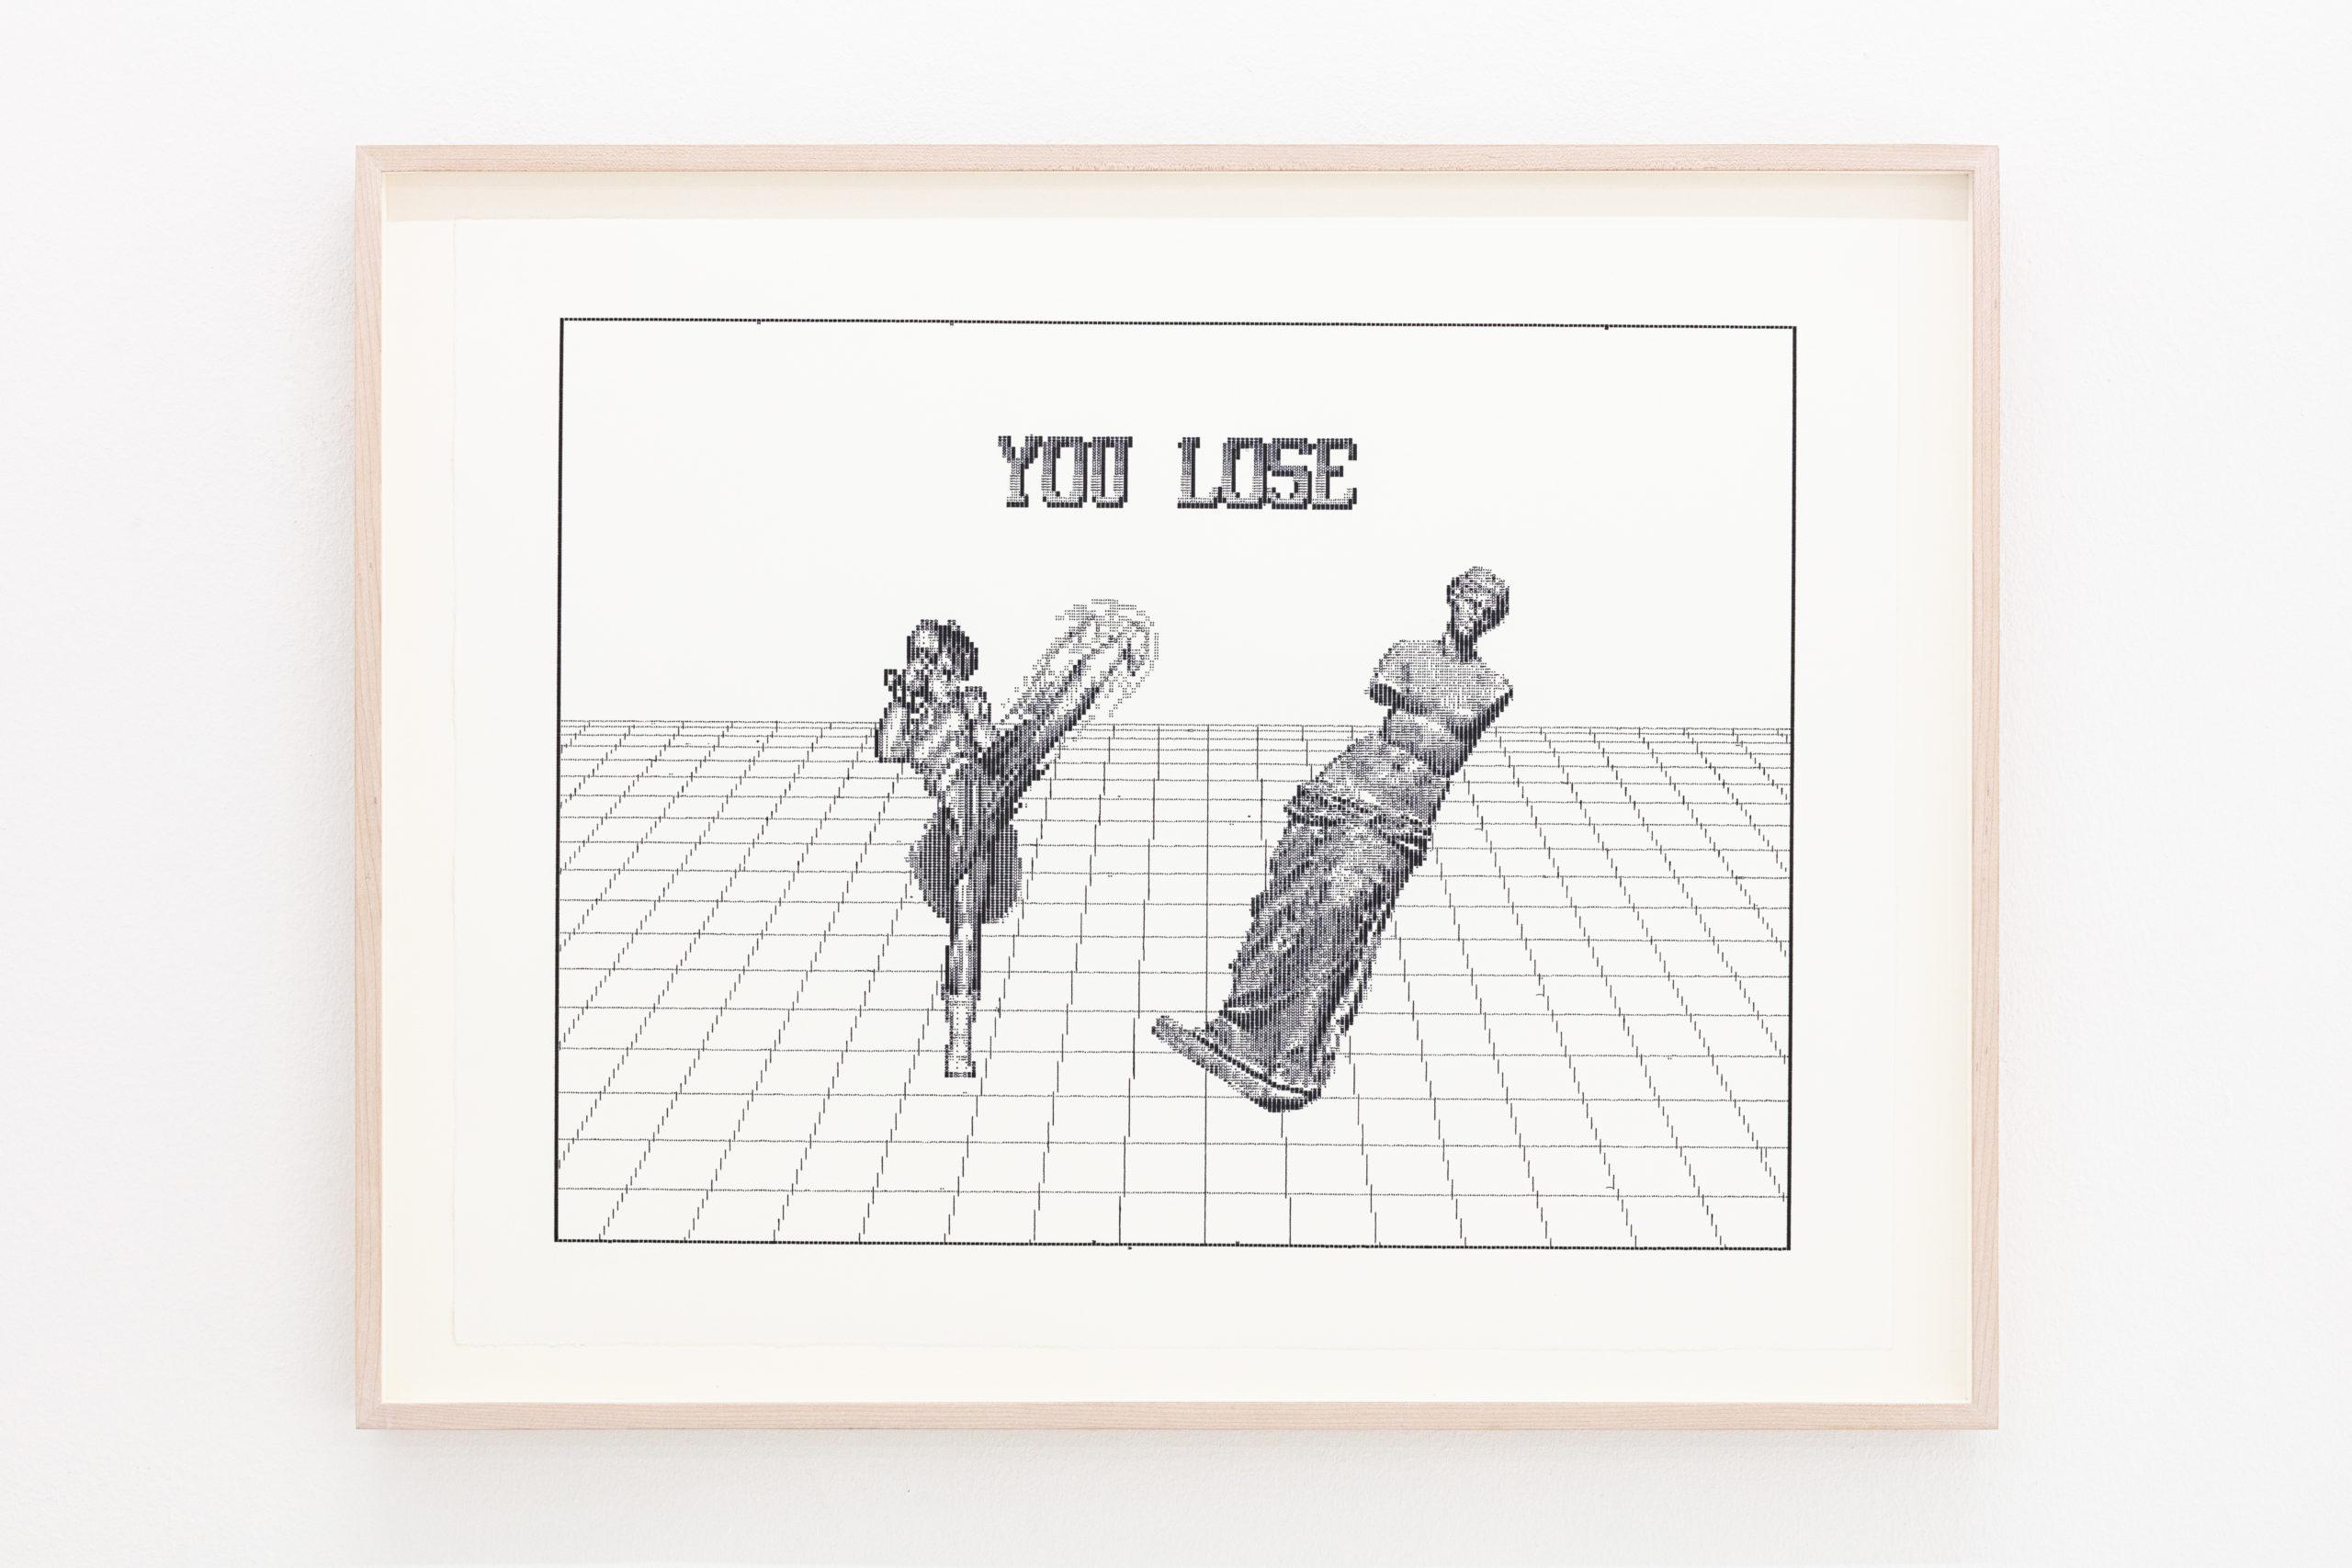 Arno Beck, Chun Li vs Venus, edition of 5, typewriter drawing on Alt Burgund paper, 53,5 x 60 cm, 2019